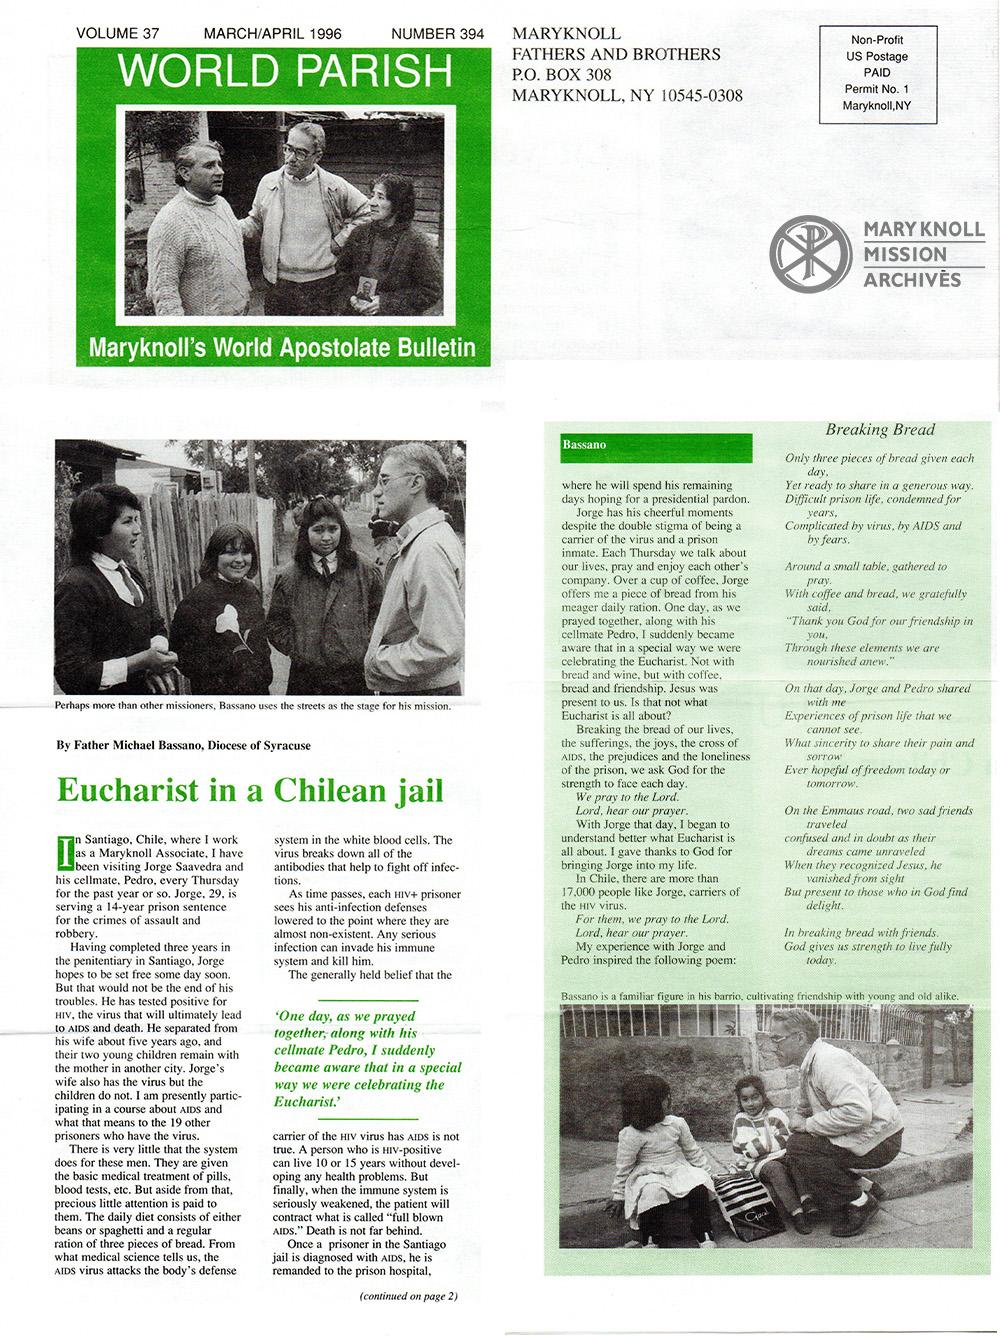 World Parish, March/April 1996